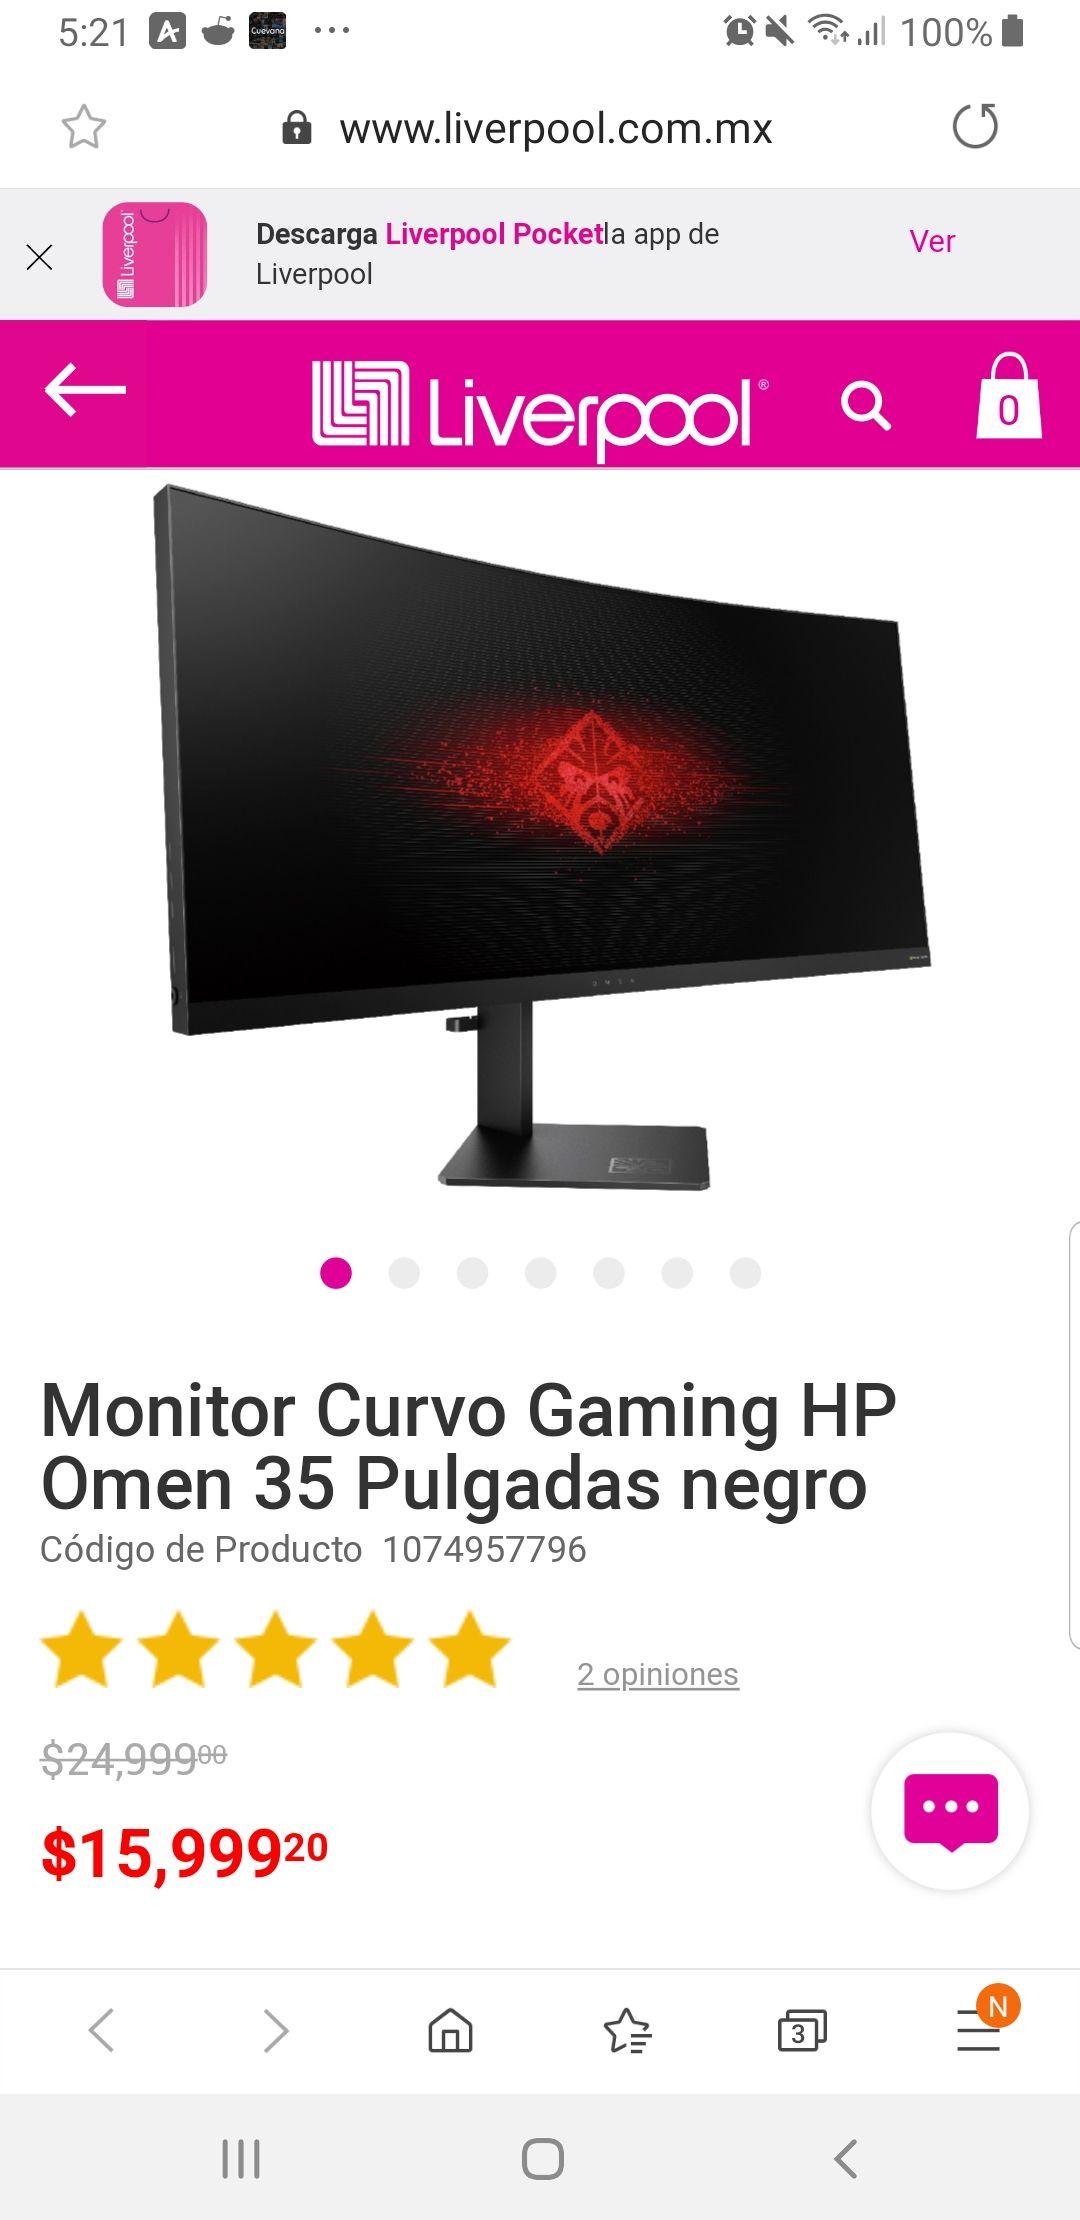 Liverpool en línea: Monitor Curvo Gaming HP Omen 35 Pulgadas negro